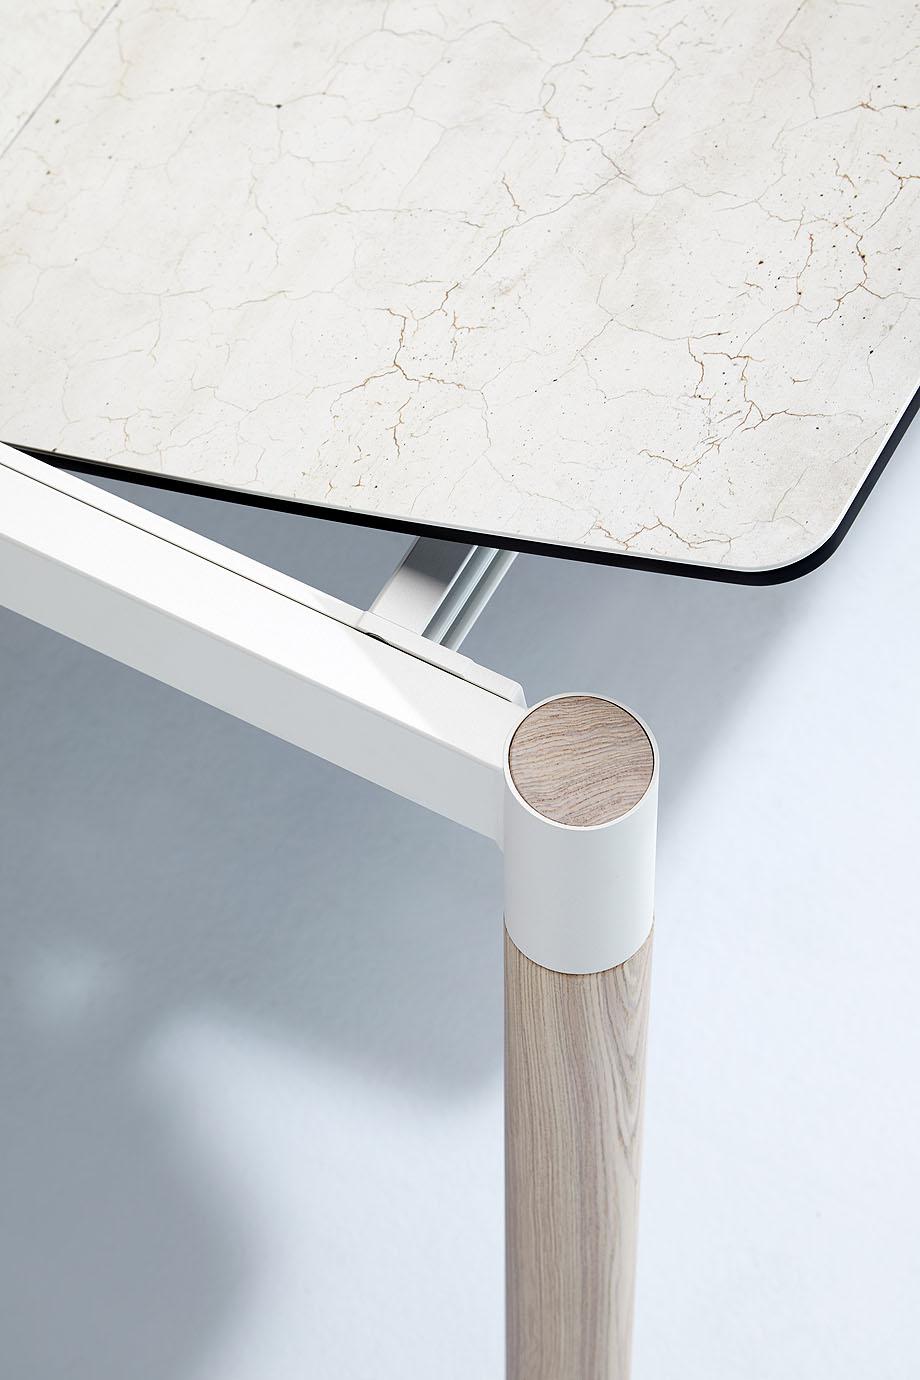 koln-yonoh-mobliberica-seating-mesa-table-comfort (3)